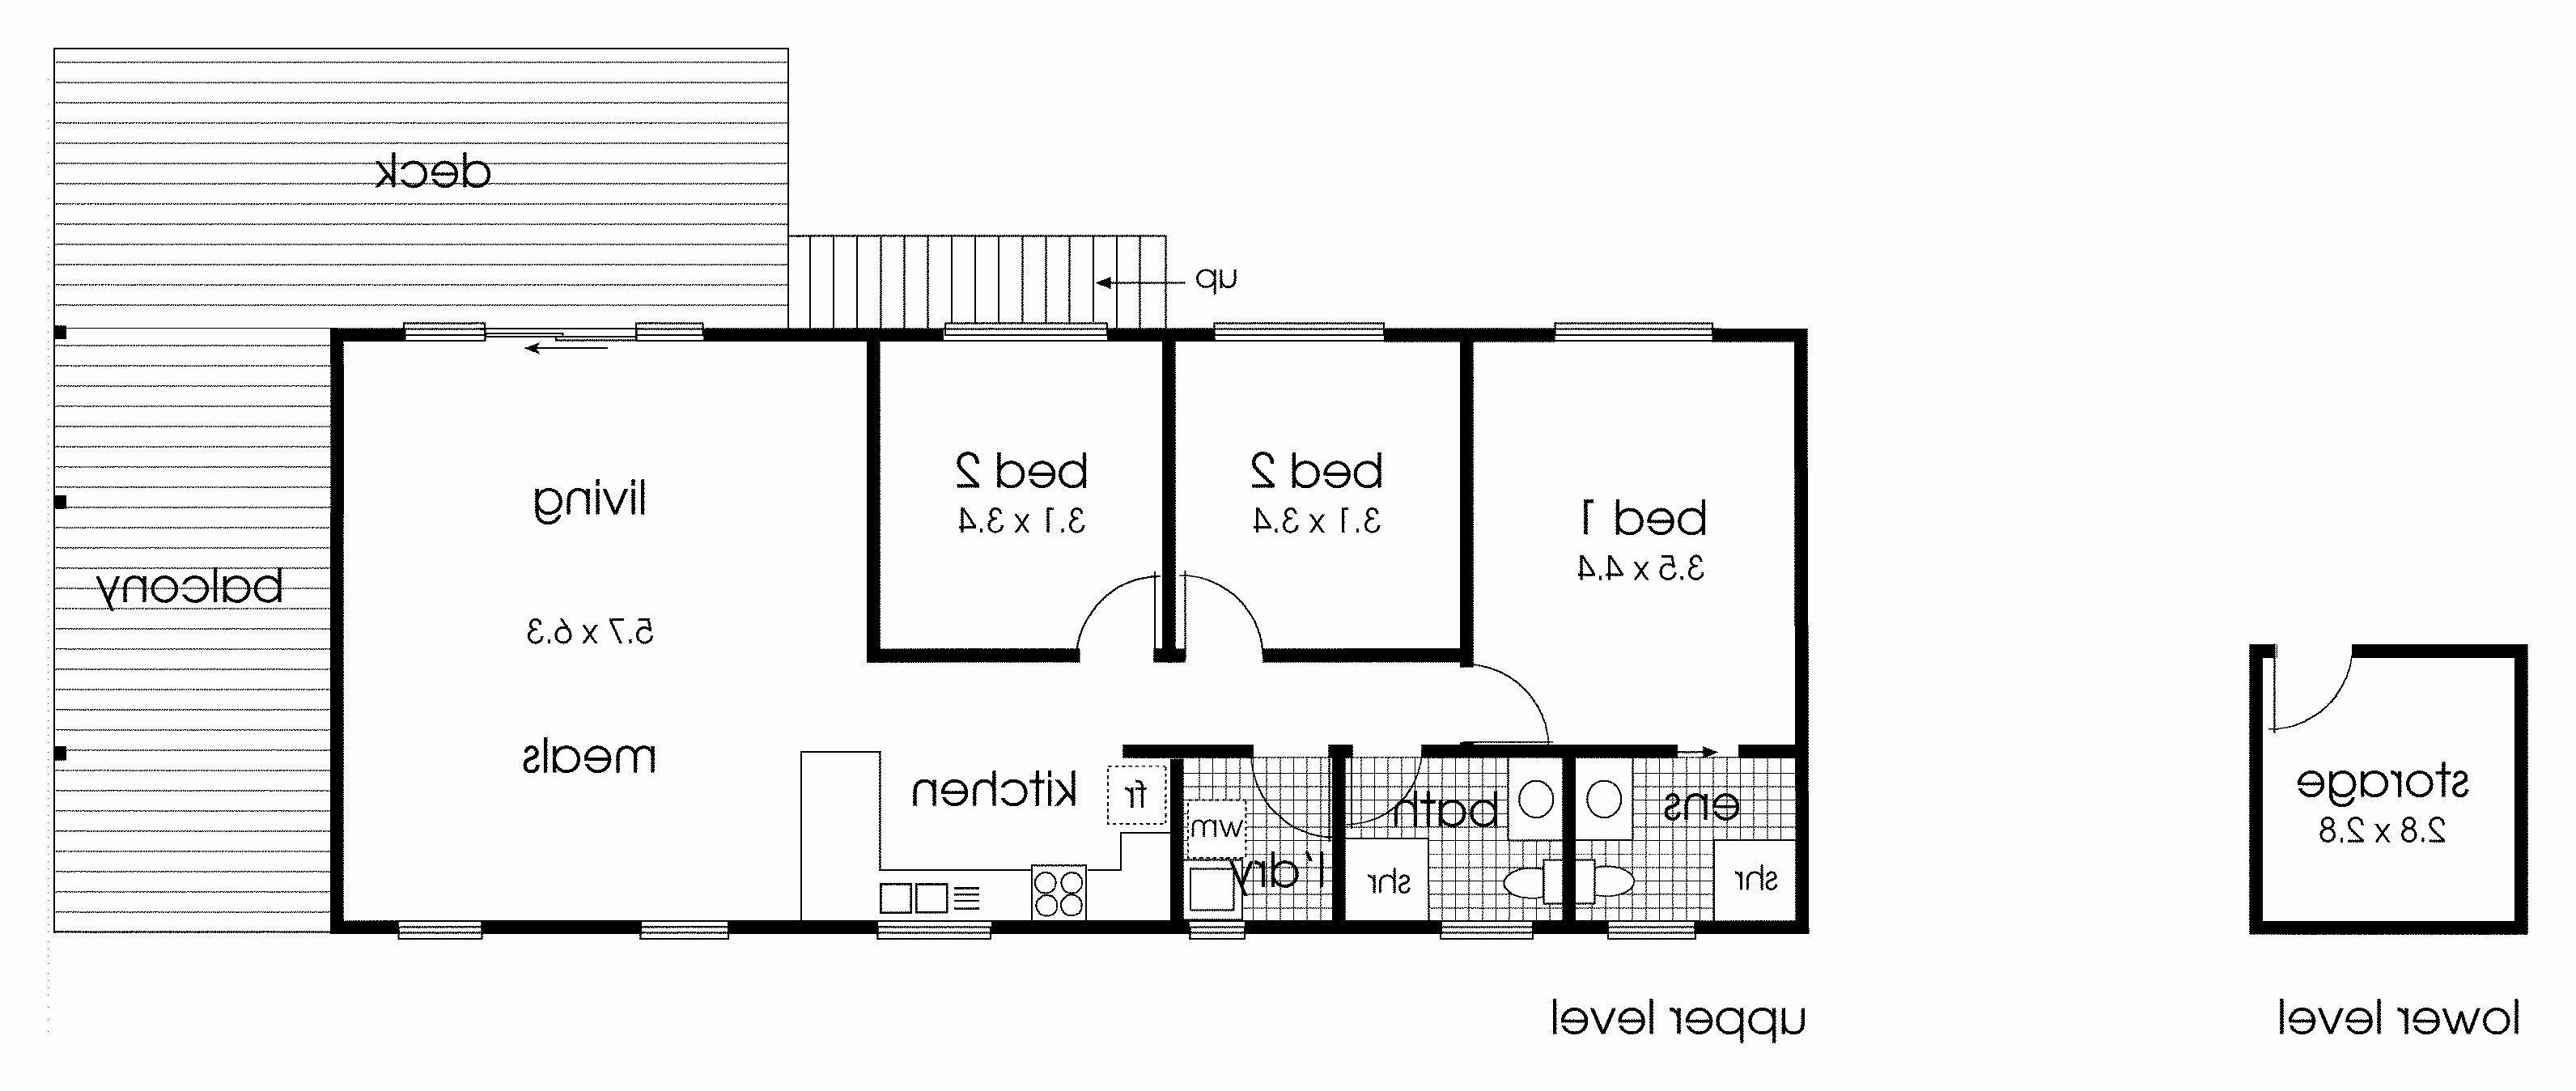 The Best Random House Floor Plan Generator And Review Cabin Floor Plans Free House Plans Floor Plan Design